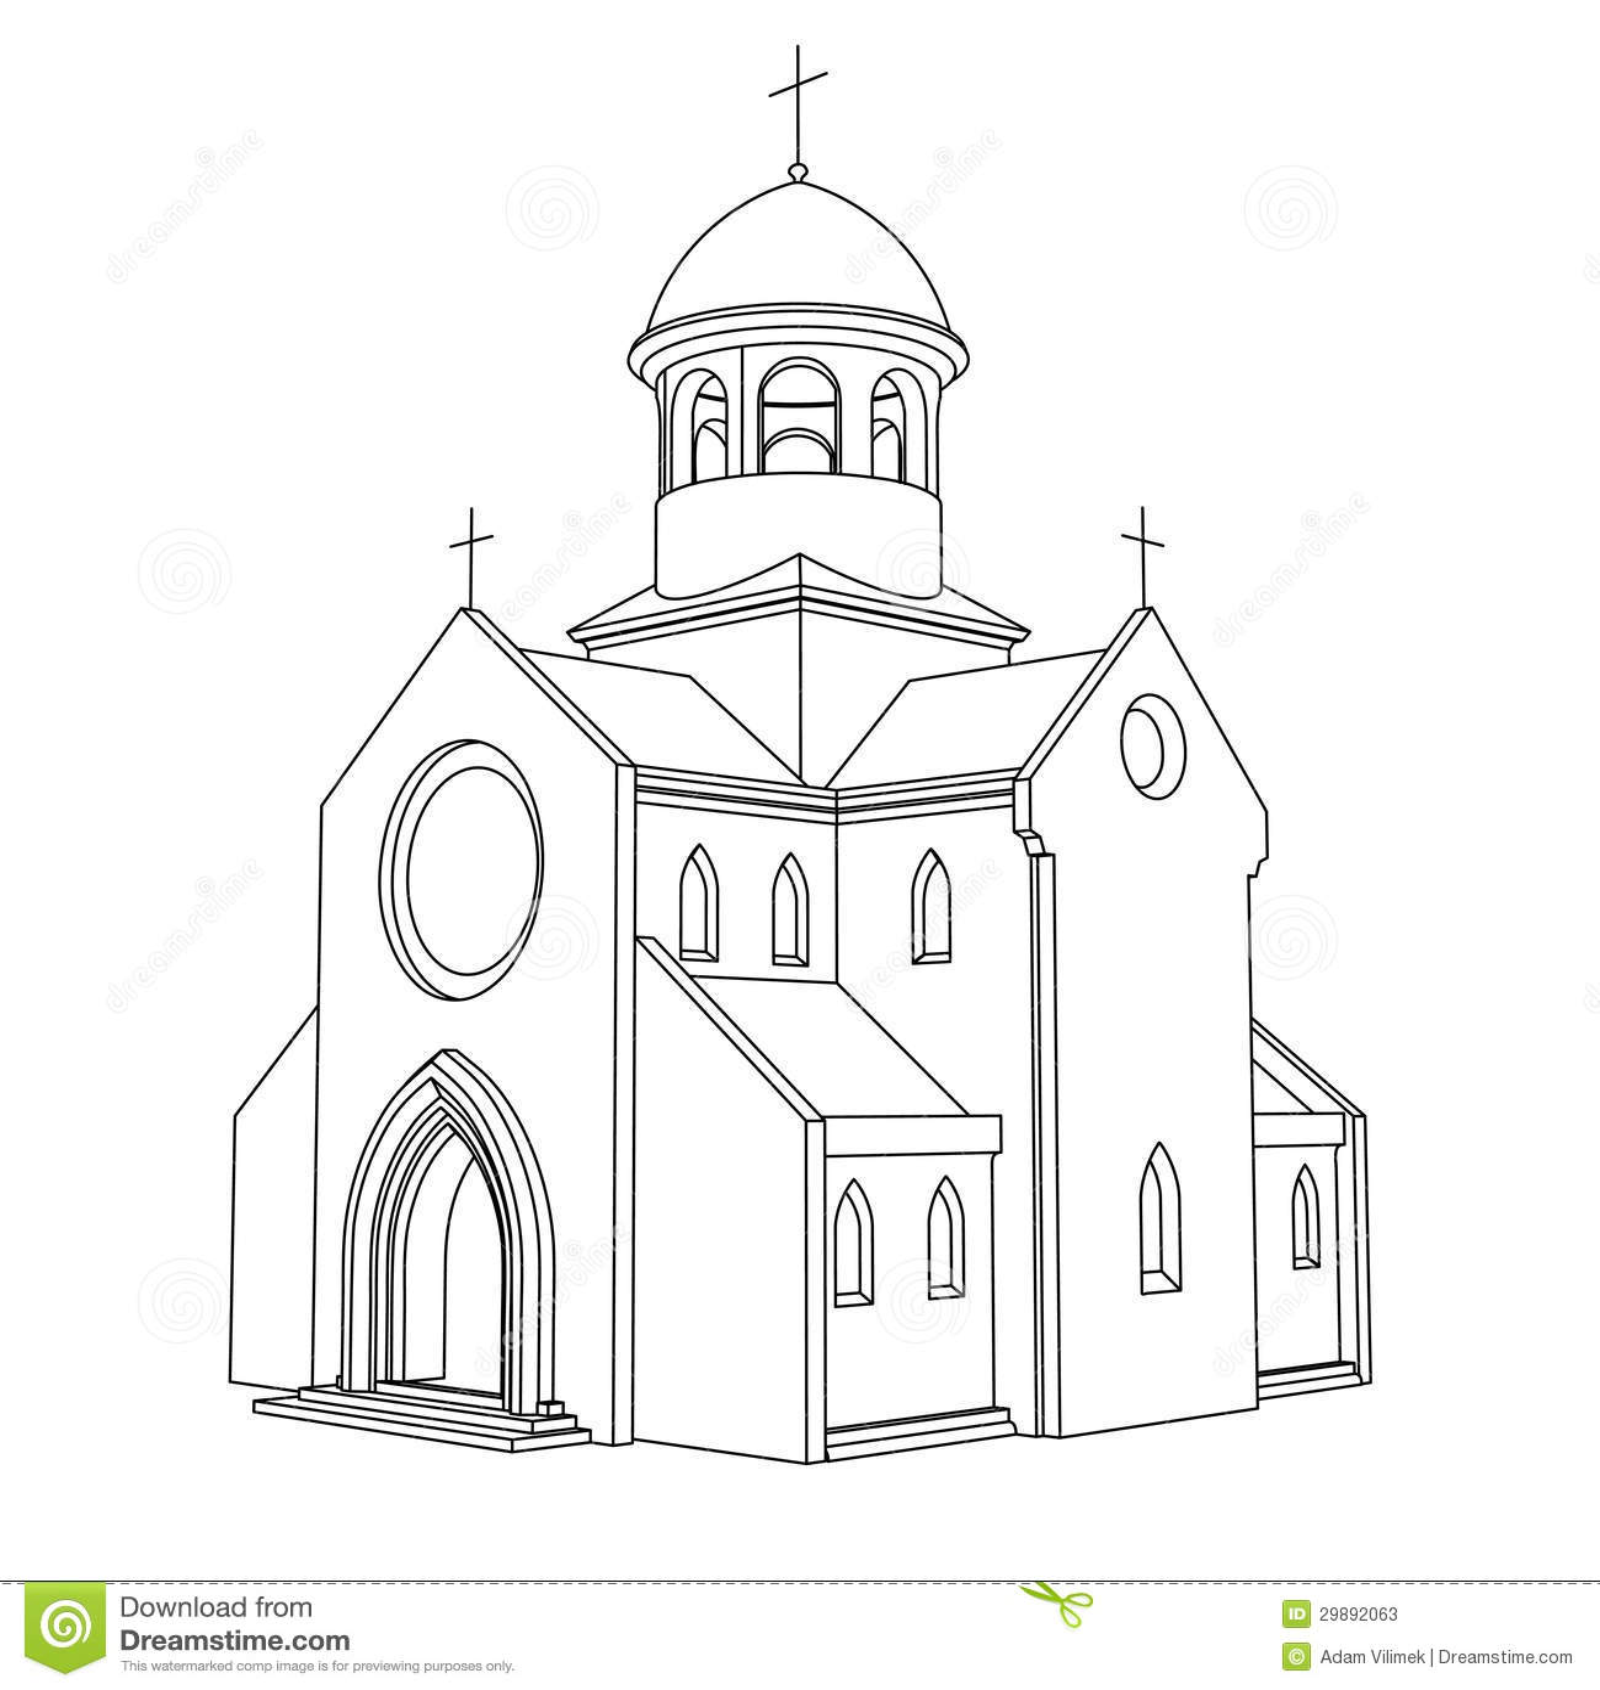 Line Art Vector Illustrator : Line art ancient basilica drawing vector stock photos